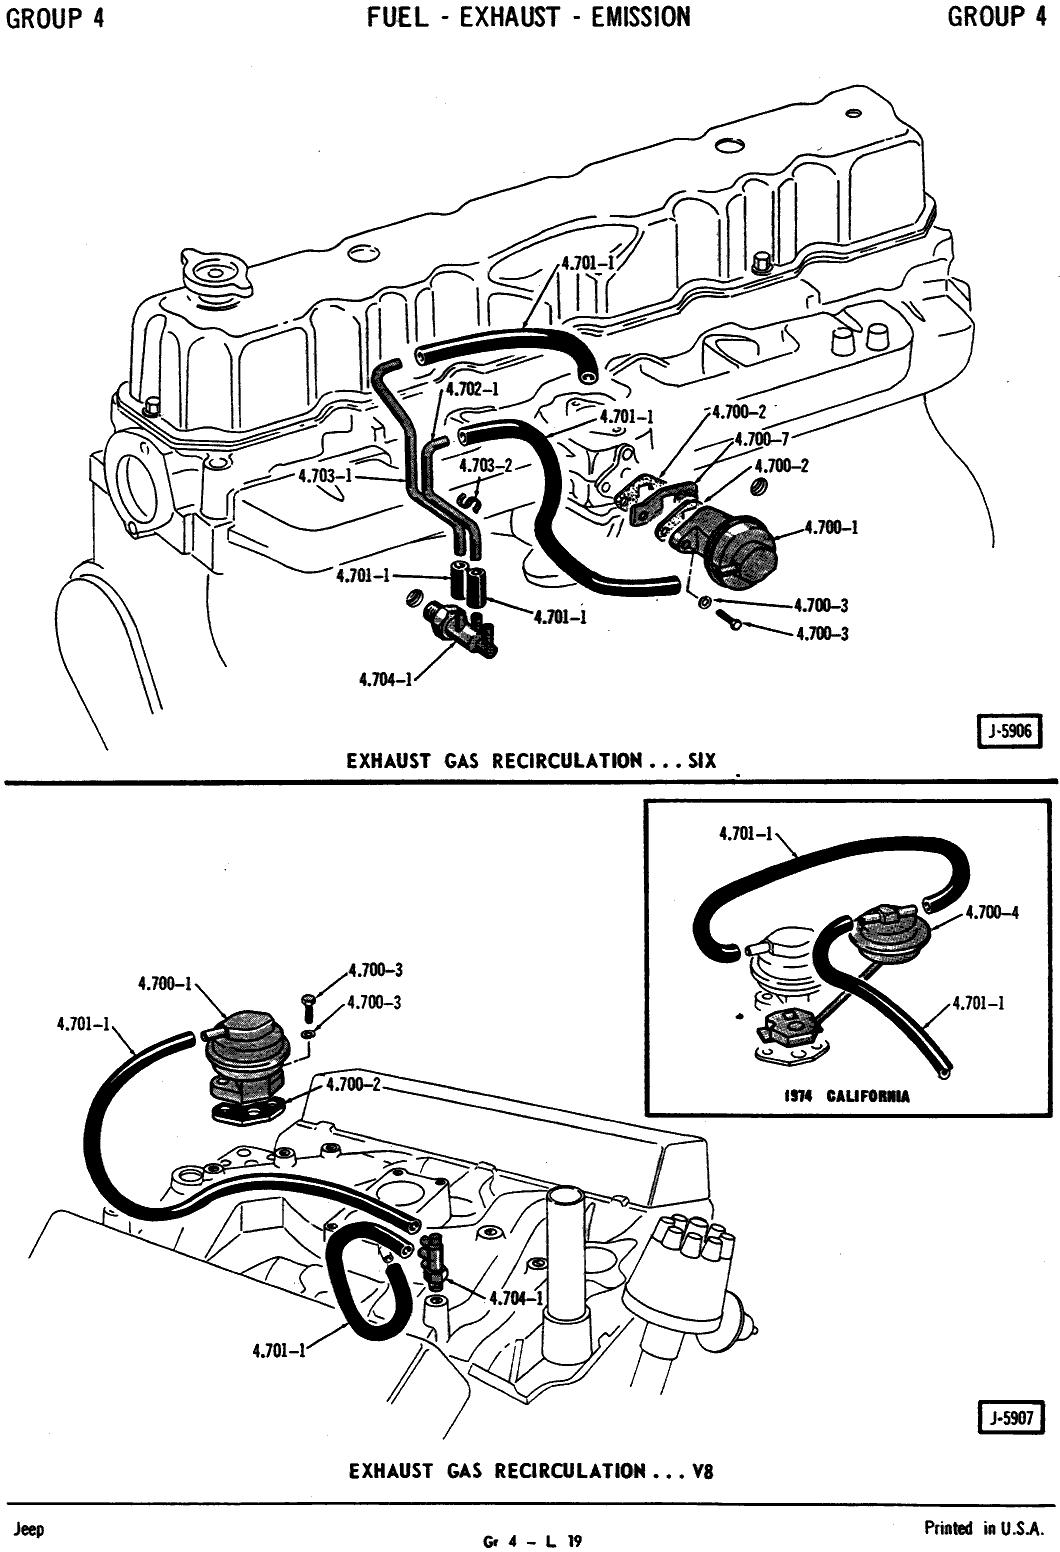 2014 jeep wrangler automatic transmission diagram html